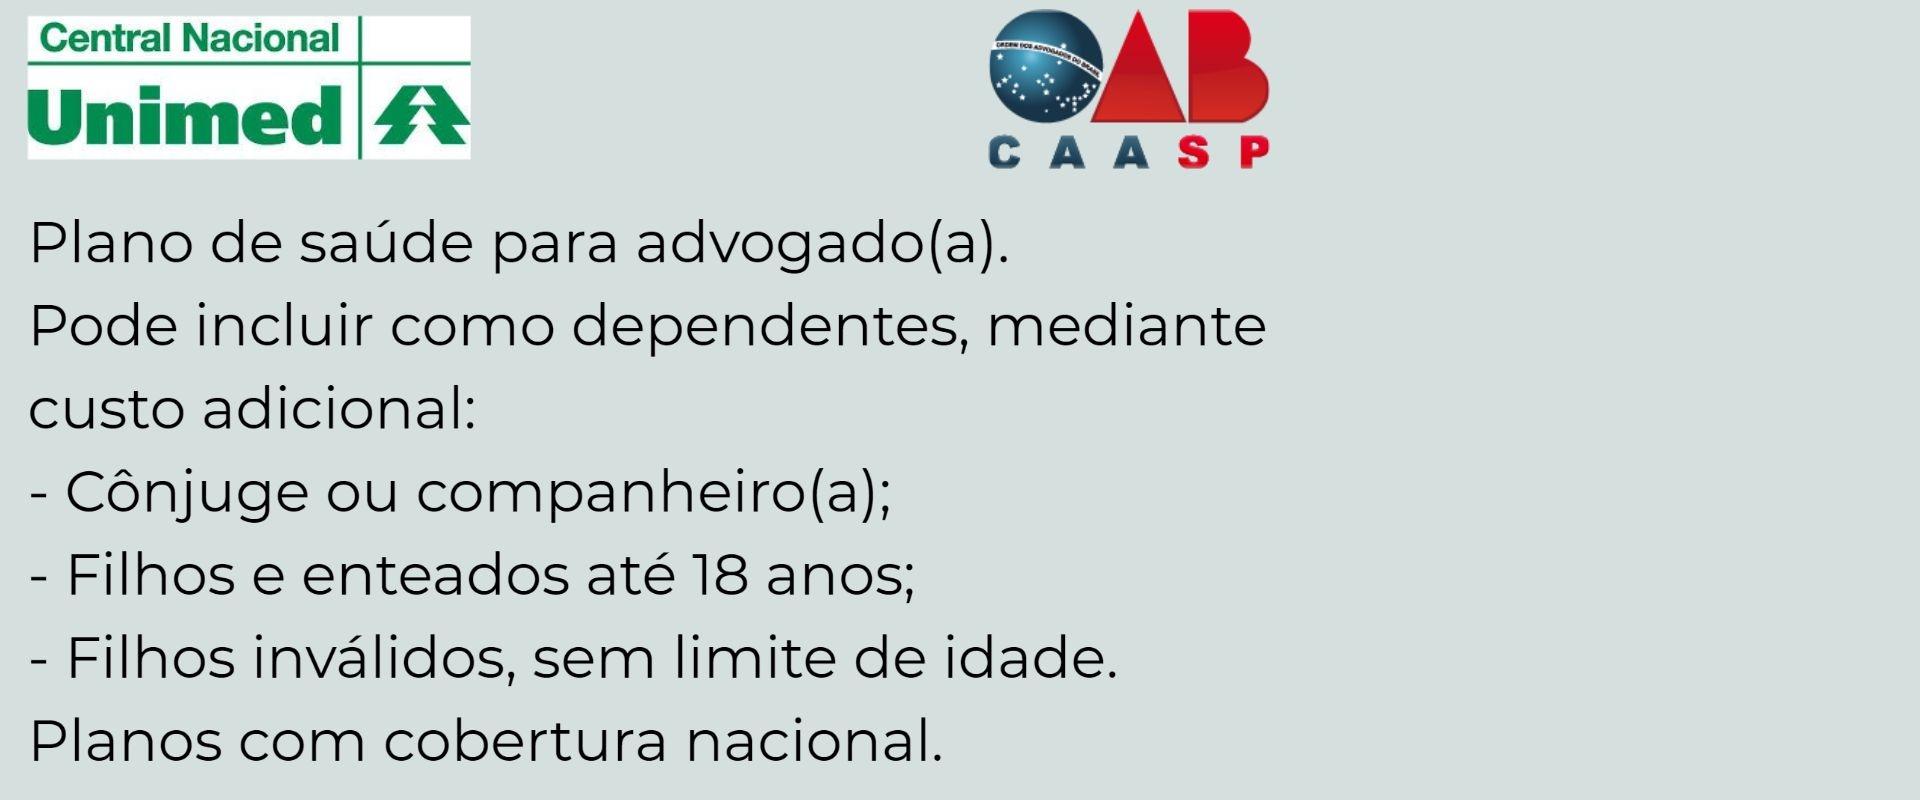 Unimed CAASP Cruzeiro